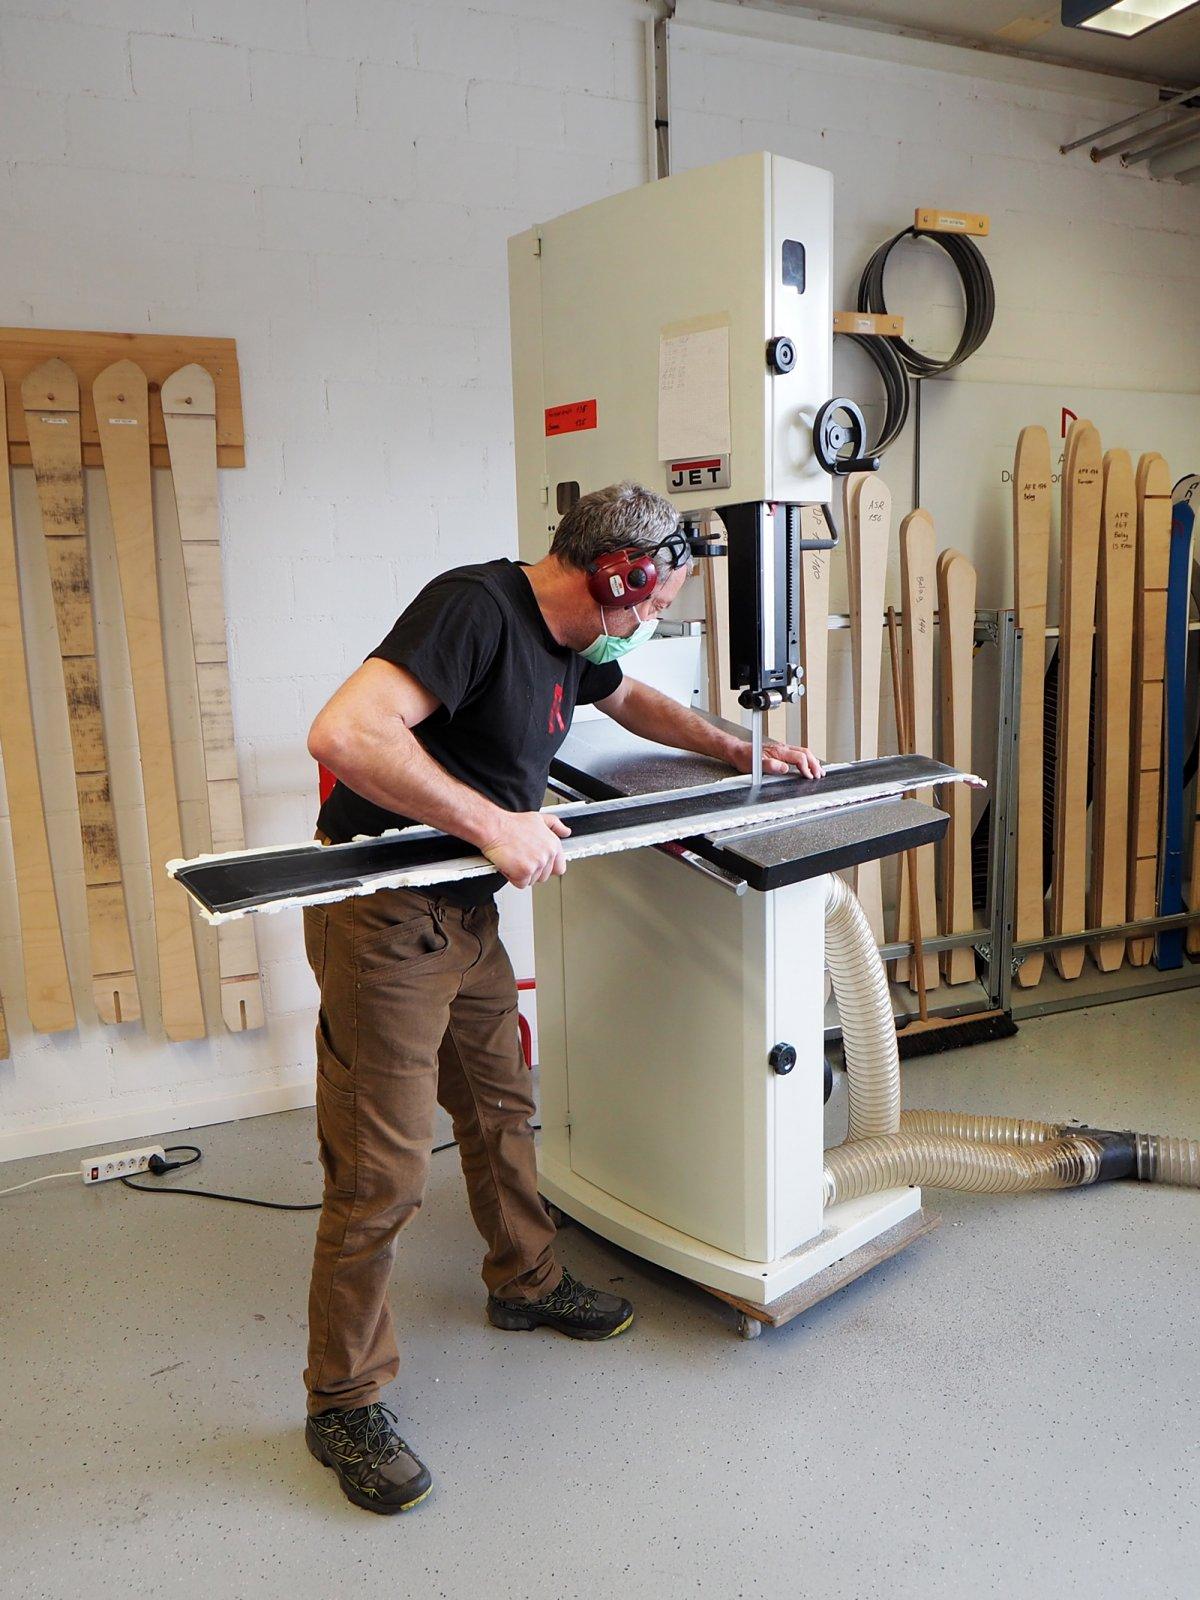 Anavon Ski-Building Workshop in Disentis